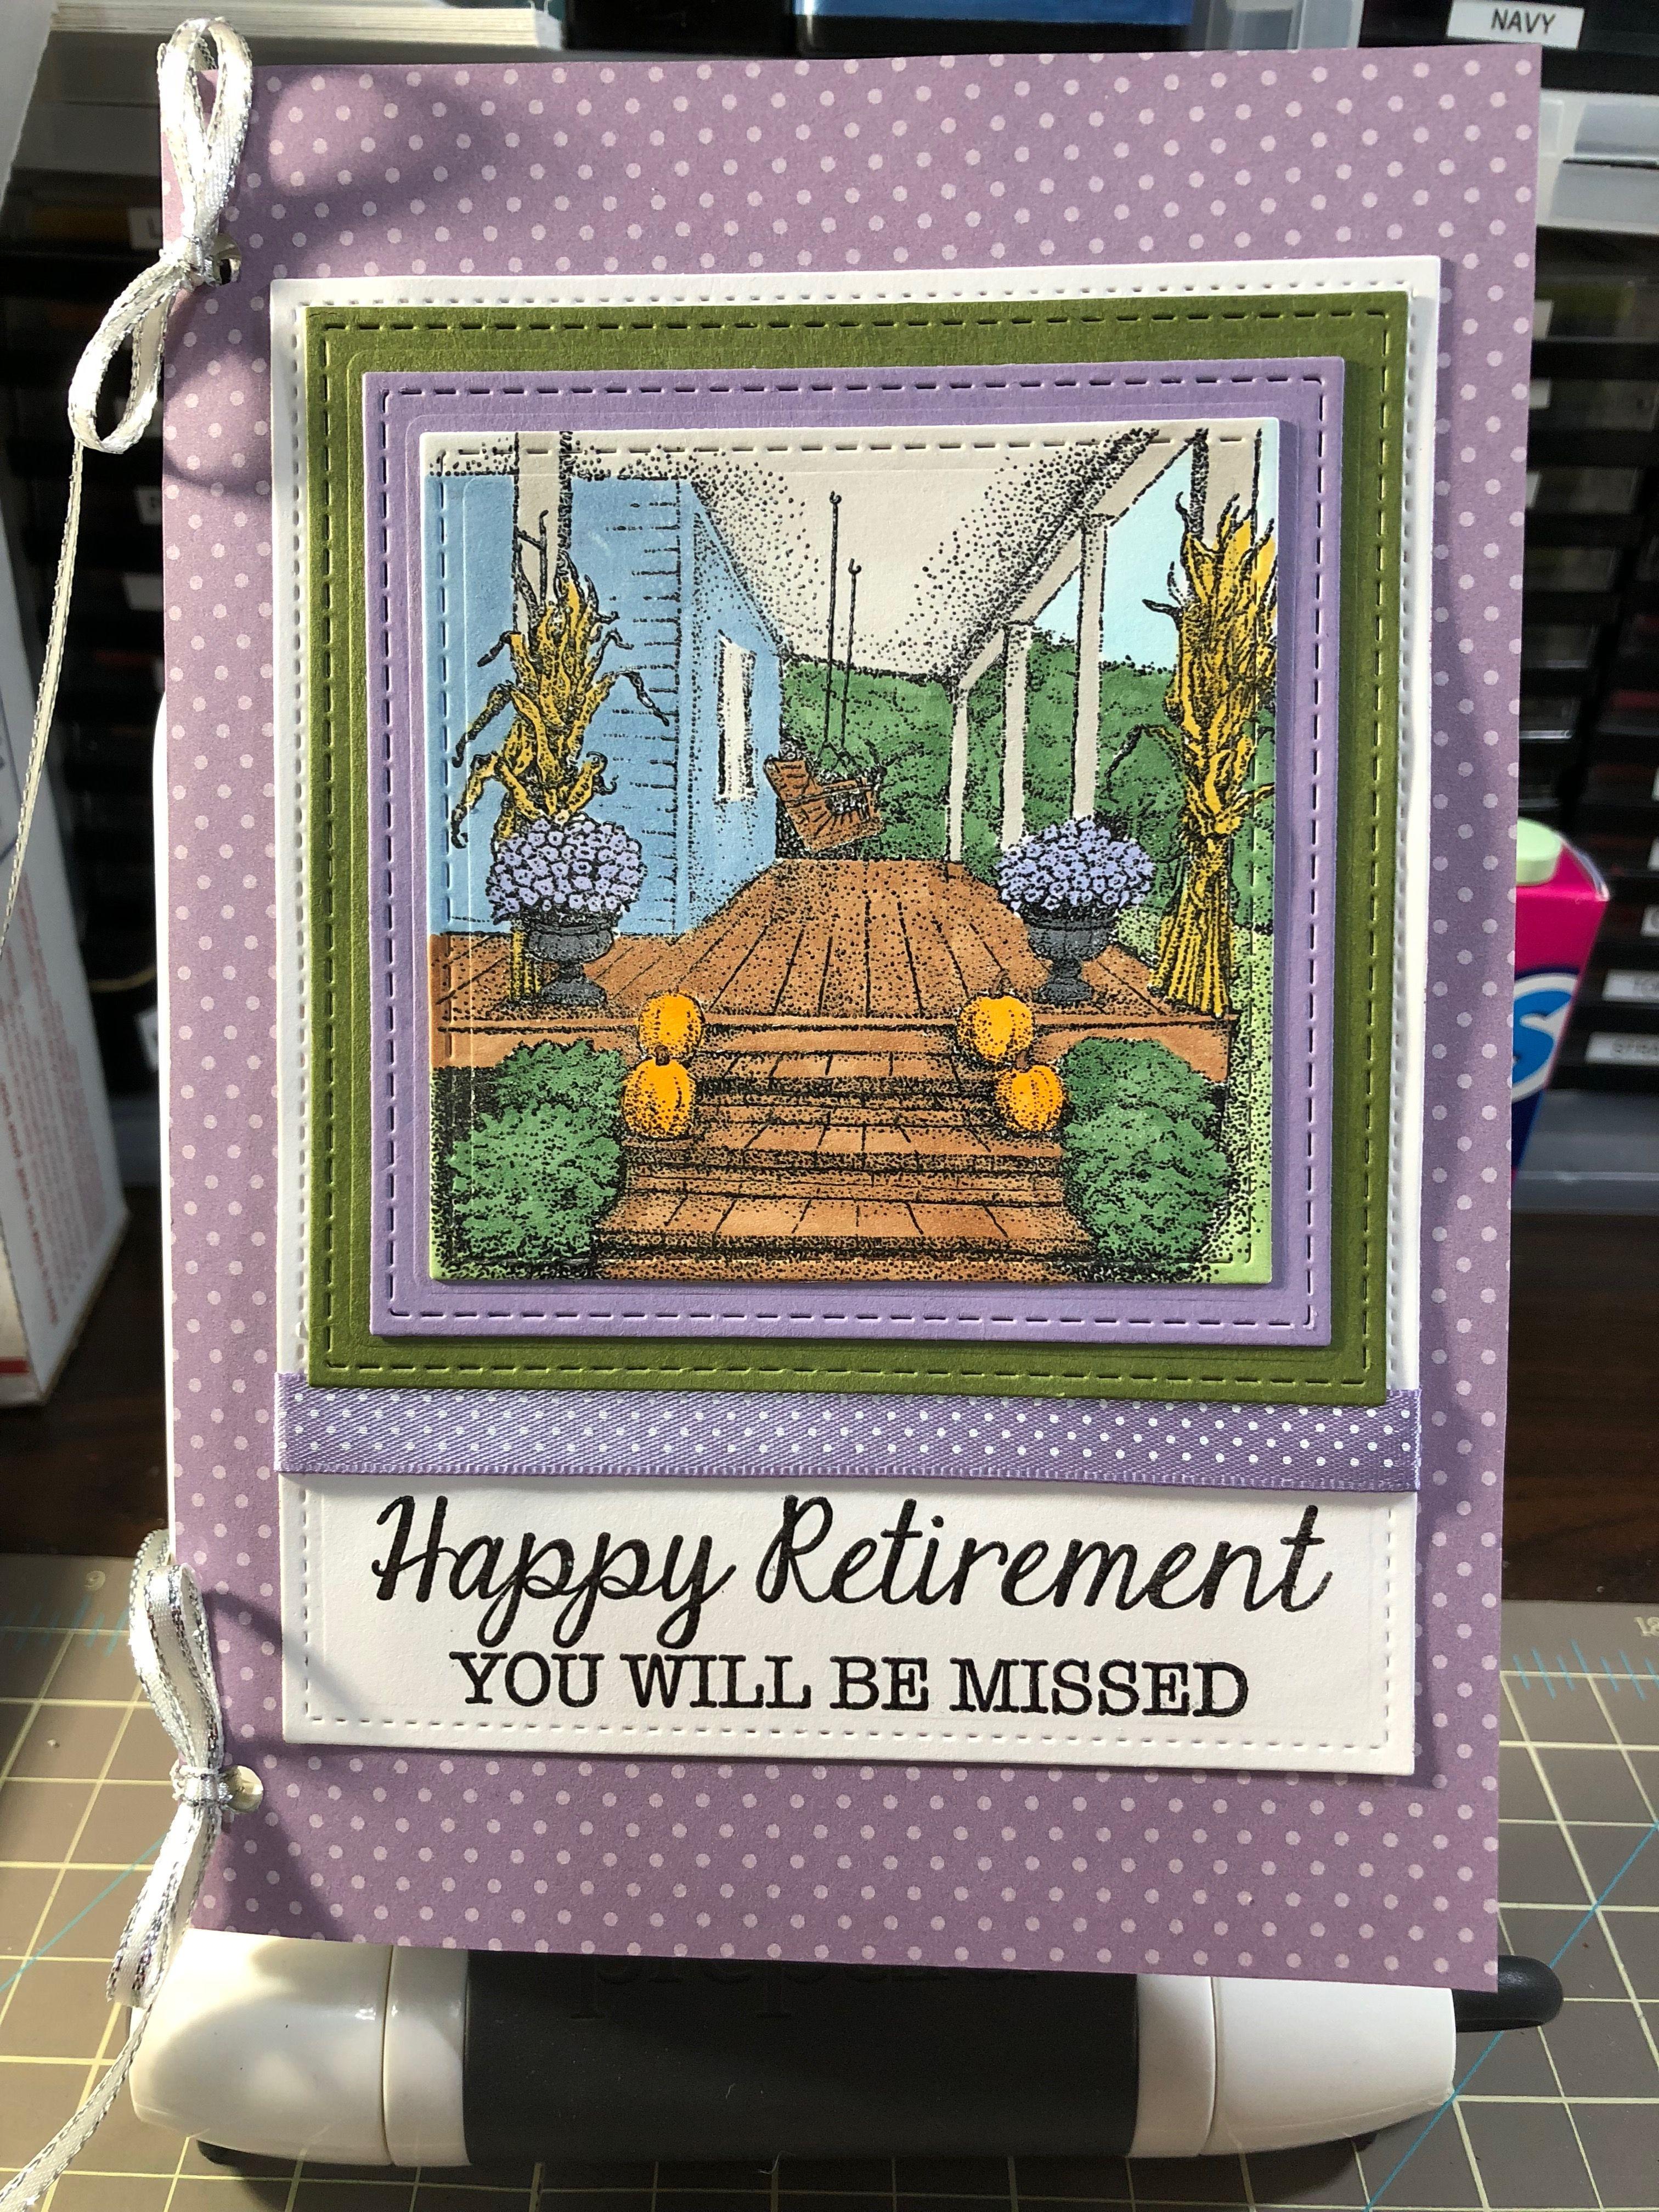 Fun Retirement Card | Retirement cards, Homemade cards, Cards |Handmade Retirement Cards